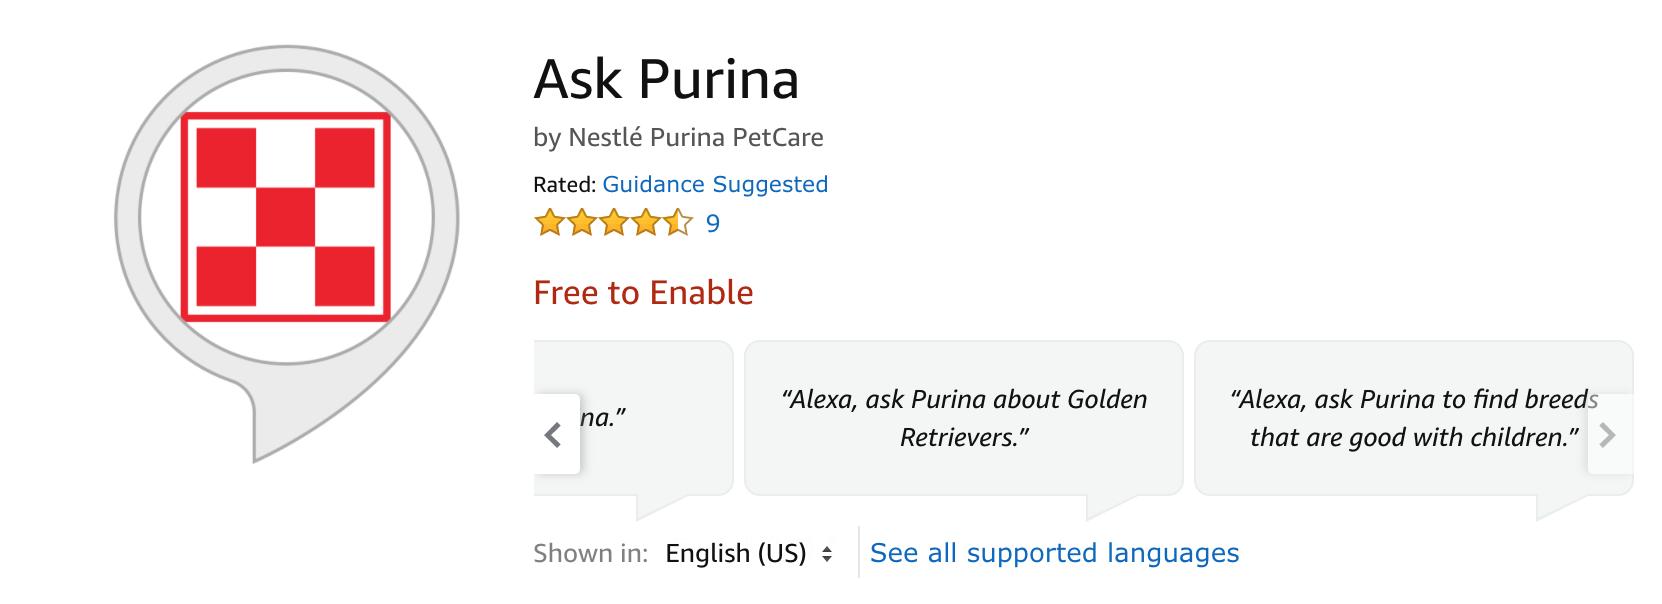 Ask Purina